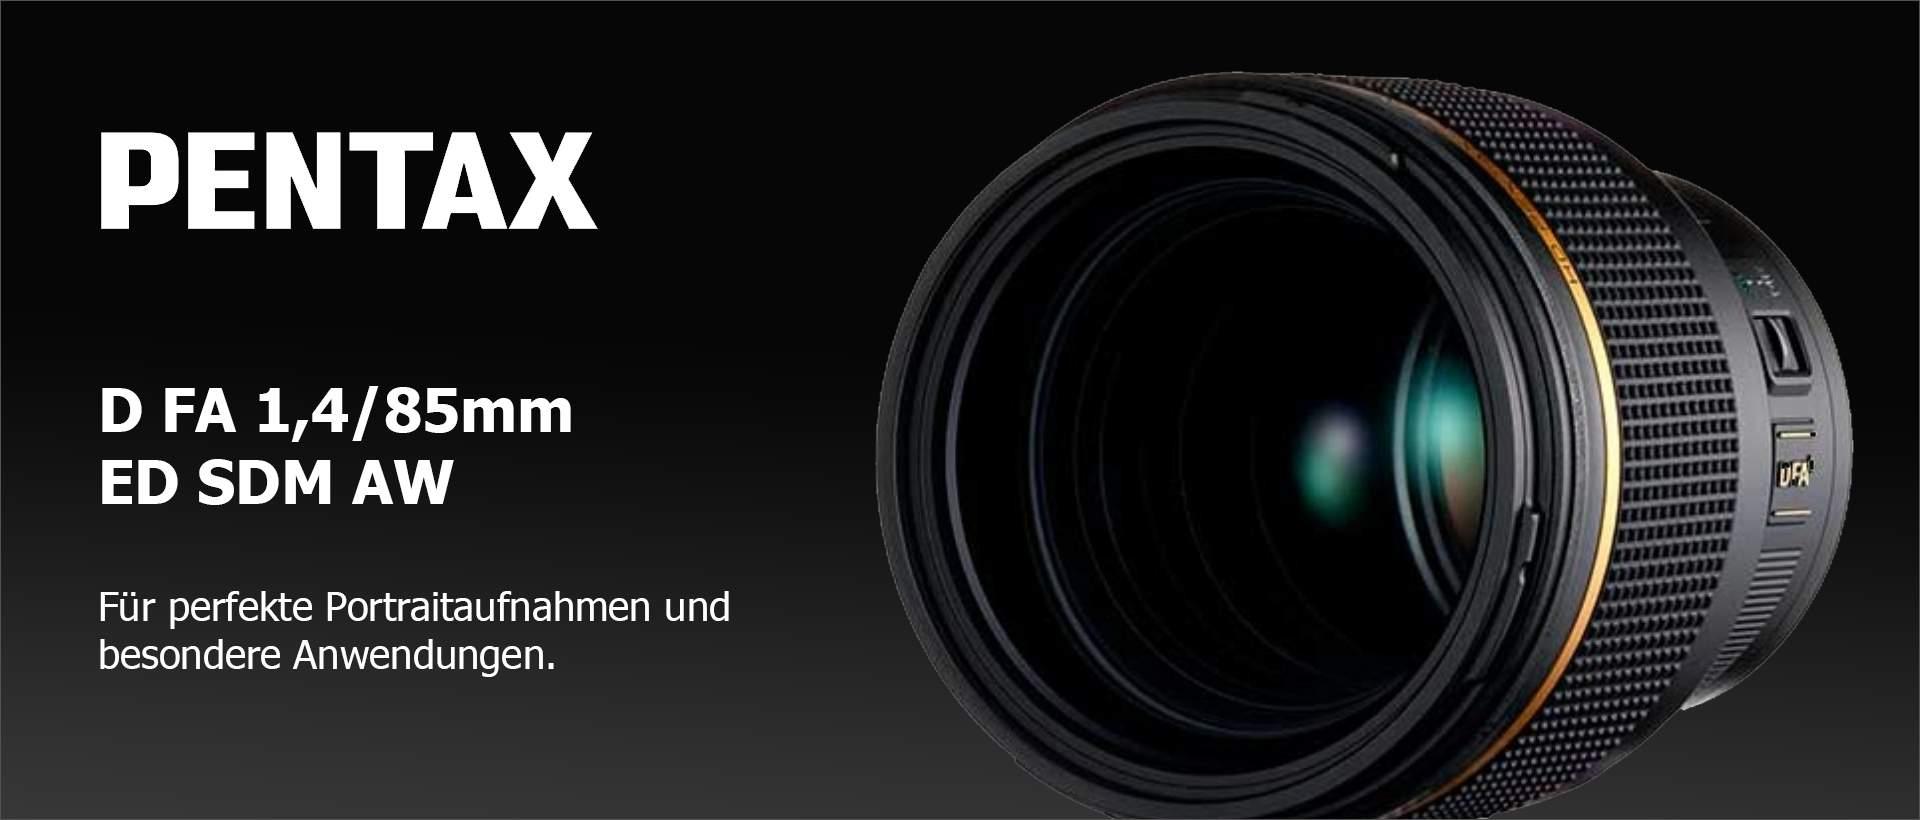 Pentax D FA 1,4/85mm ED SDM AW